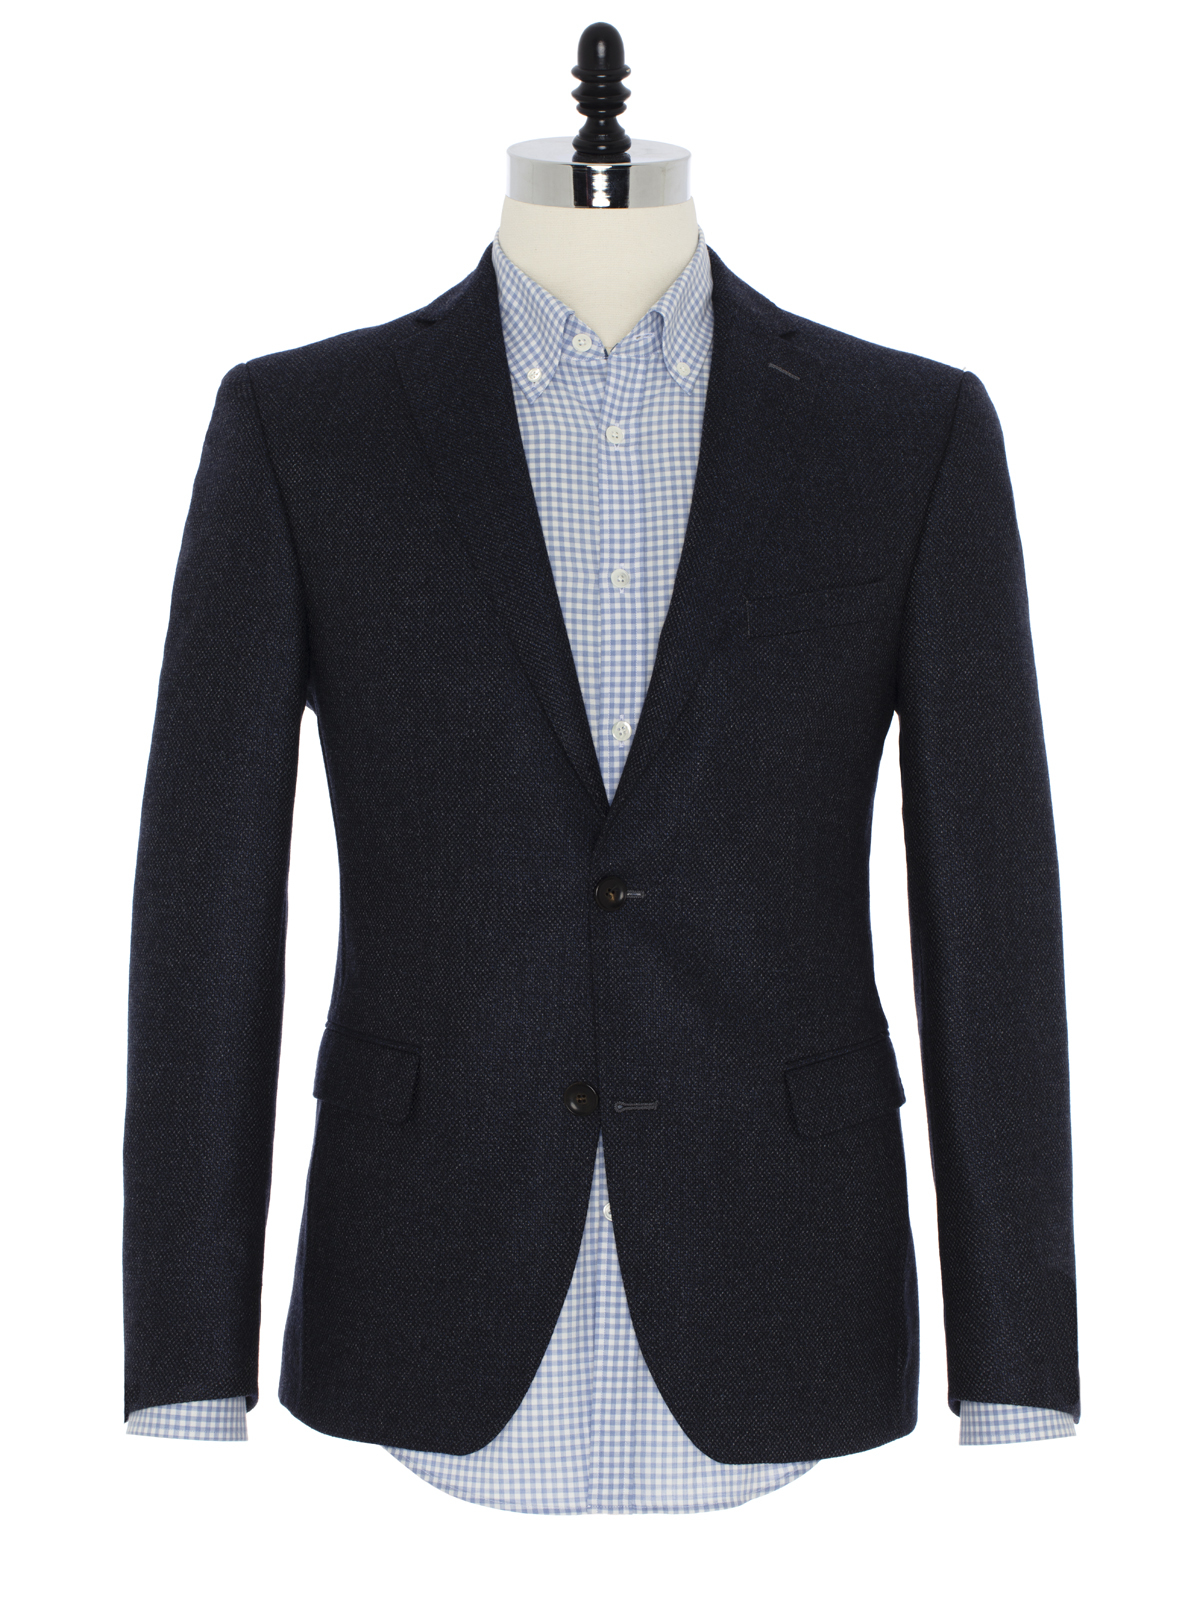 Carl Gross - Carl Gross Lacivert Tweed Yün Ceket